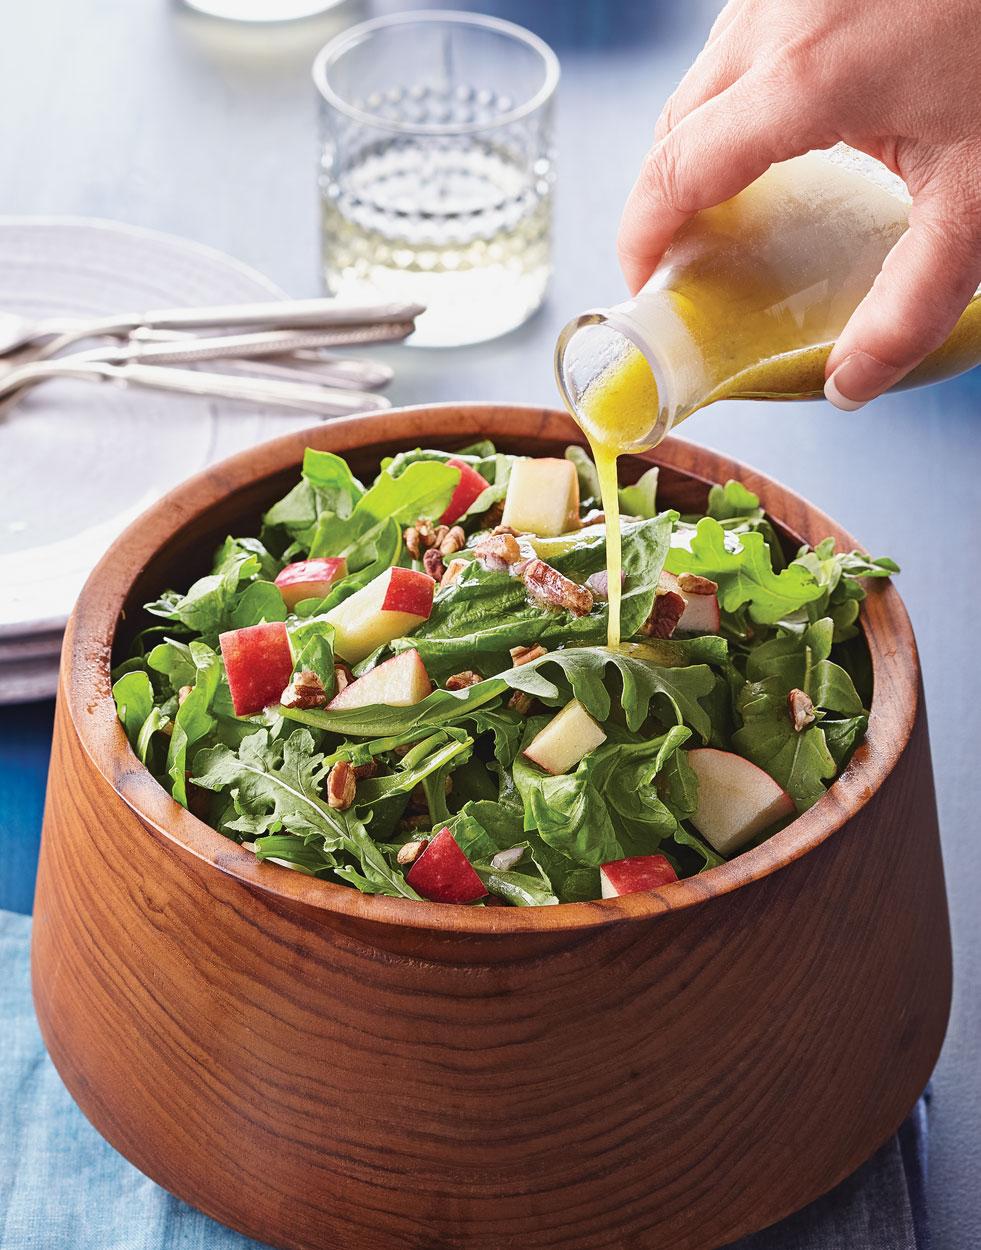 Spinach Arugula Apple Salad With Cider Vinaigrette